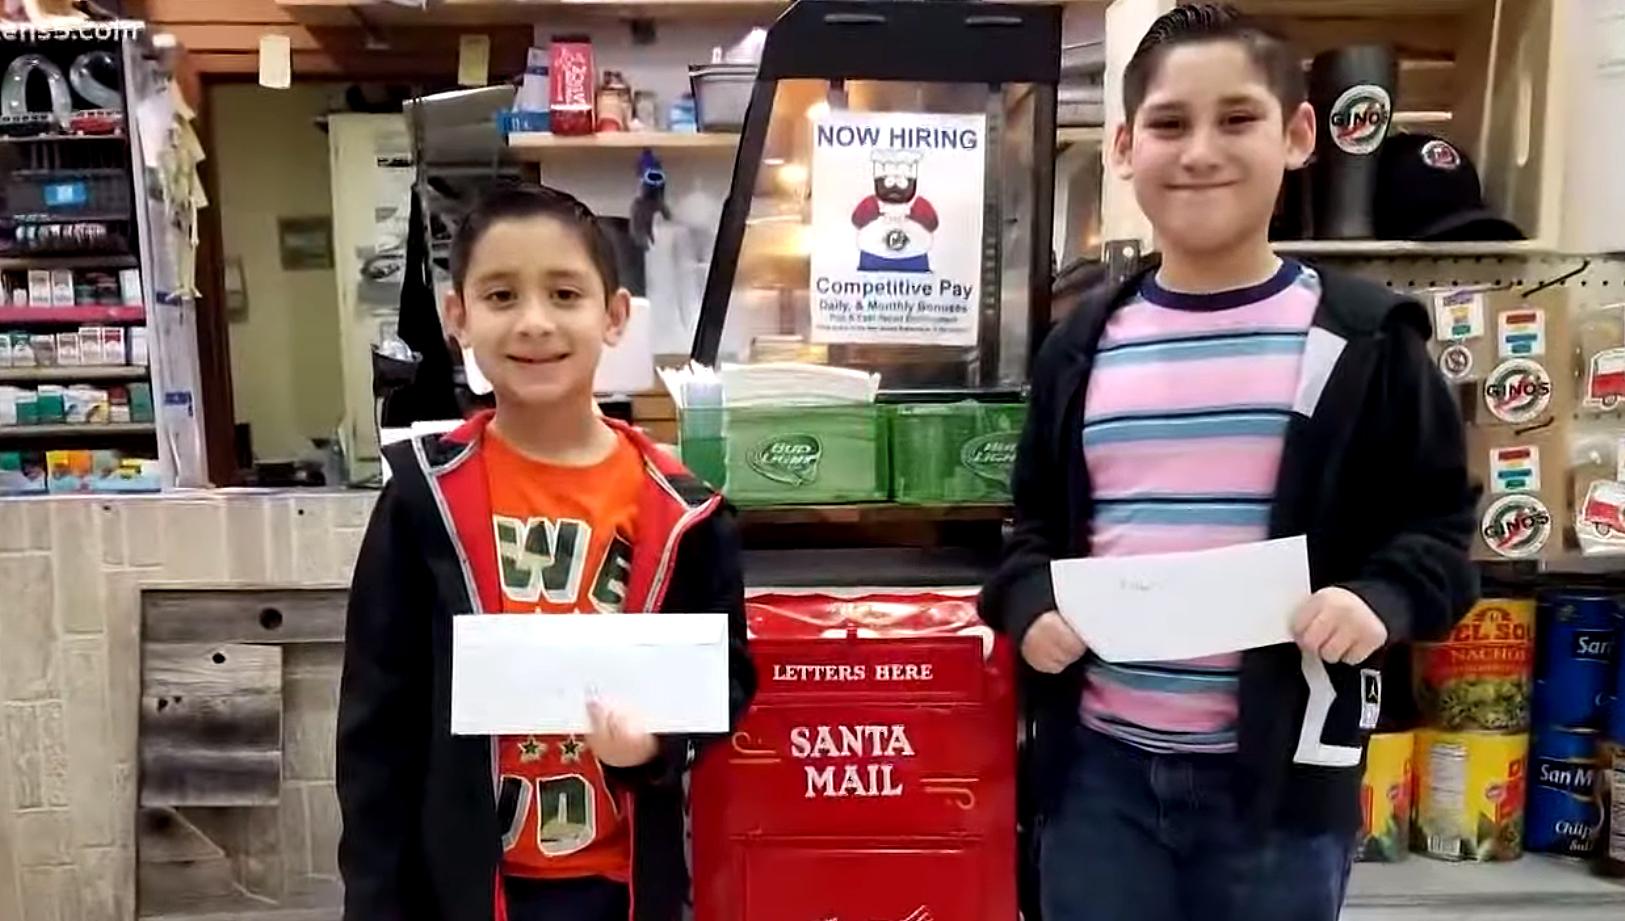 Deli Owners Santa Mailbox